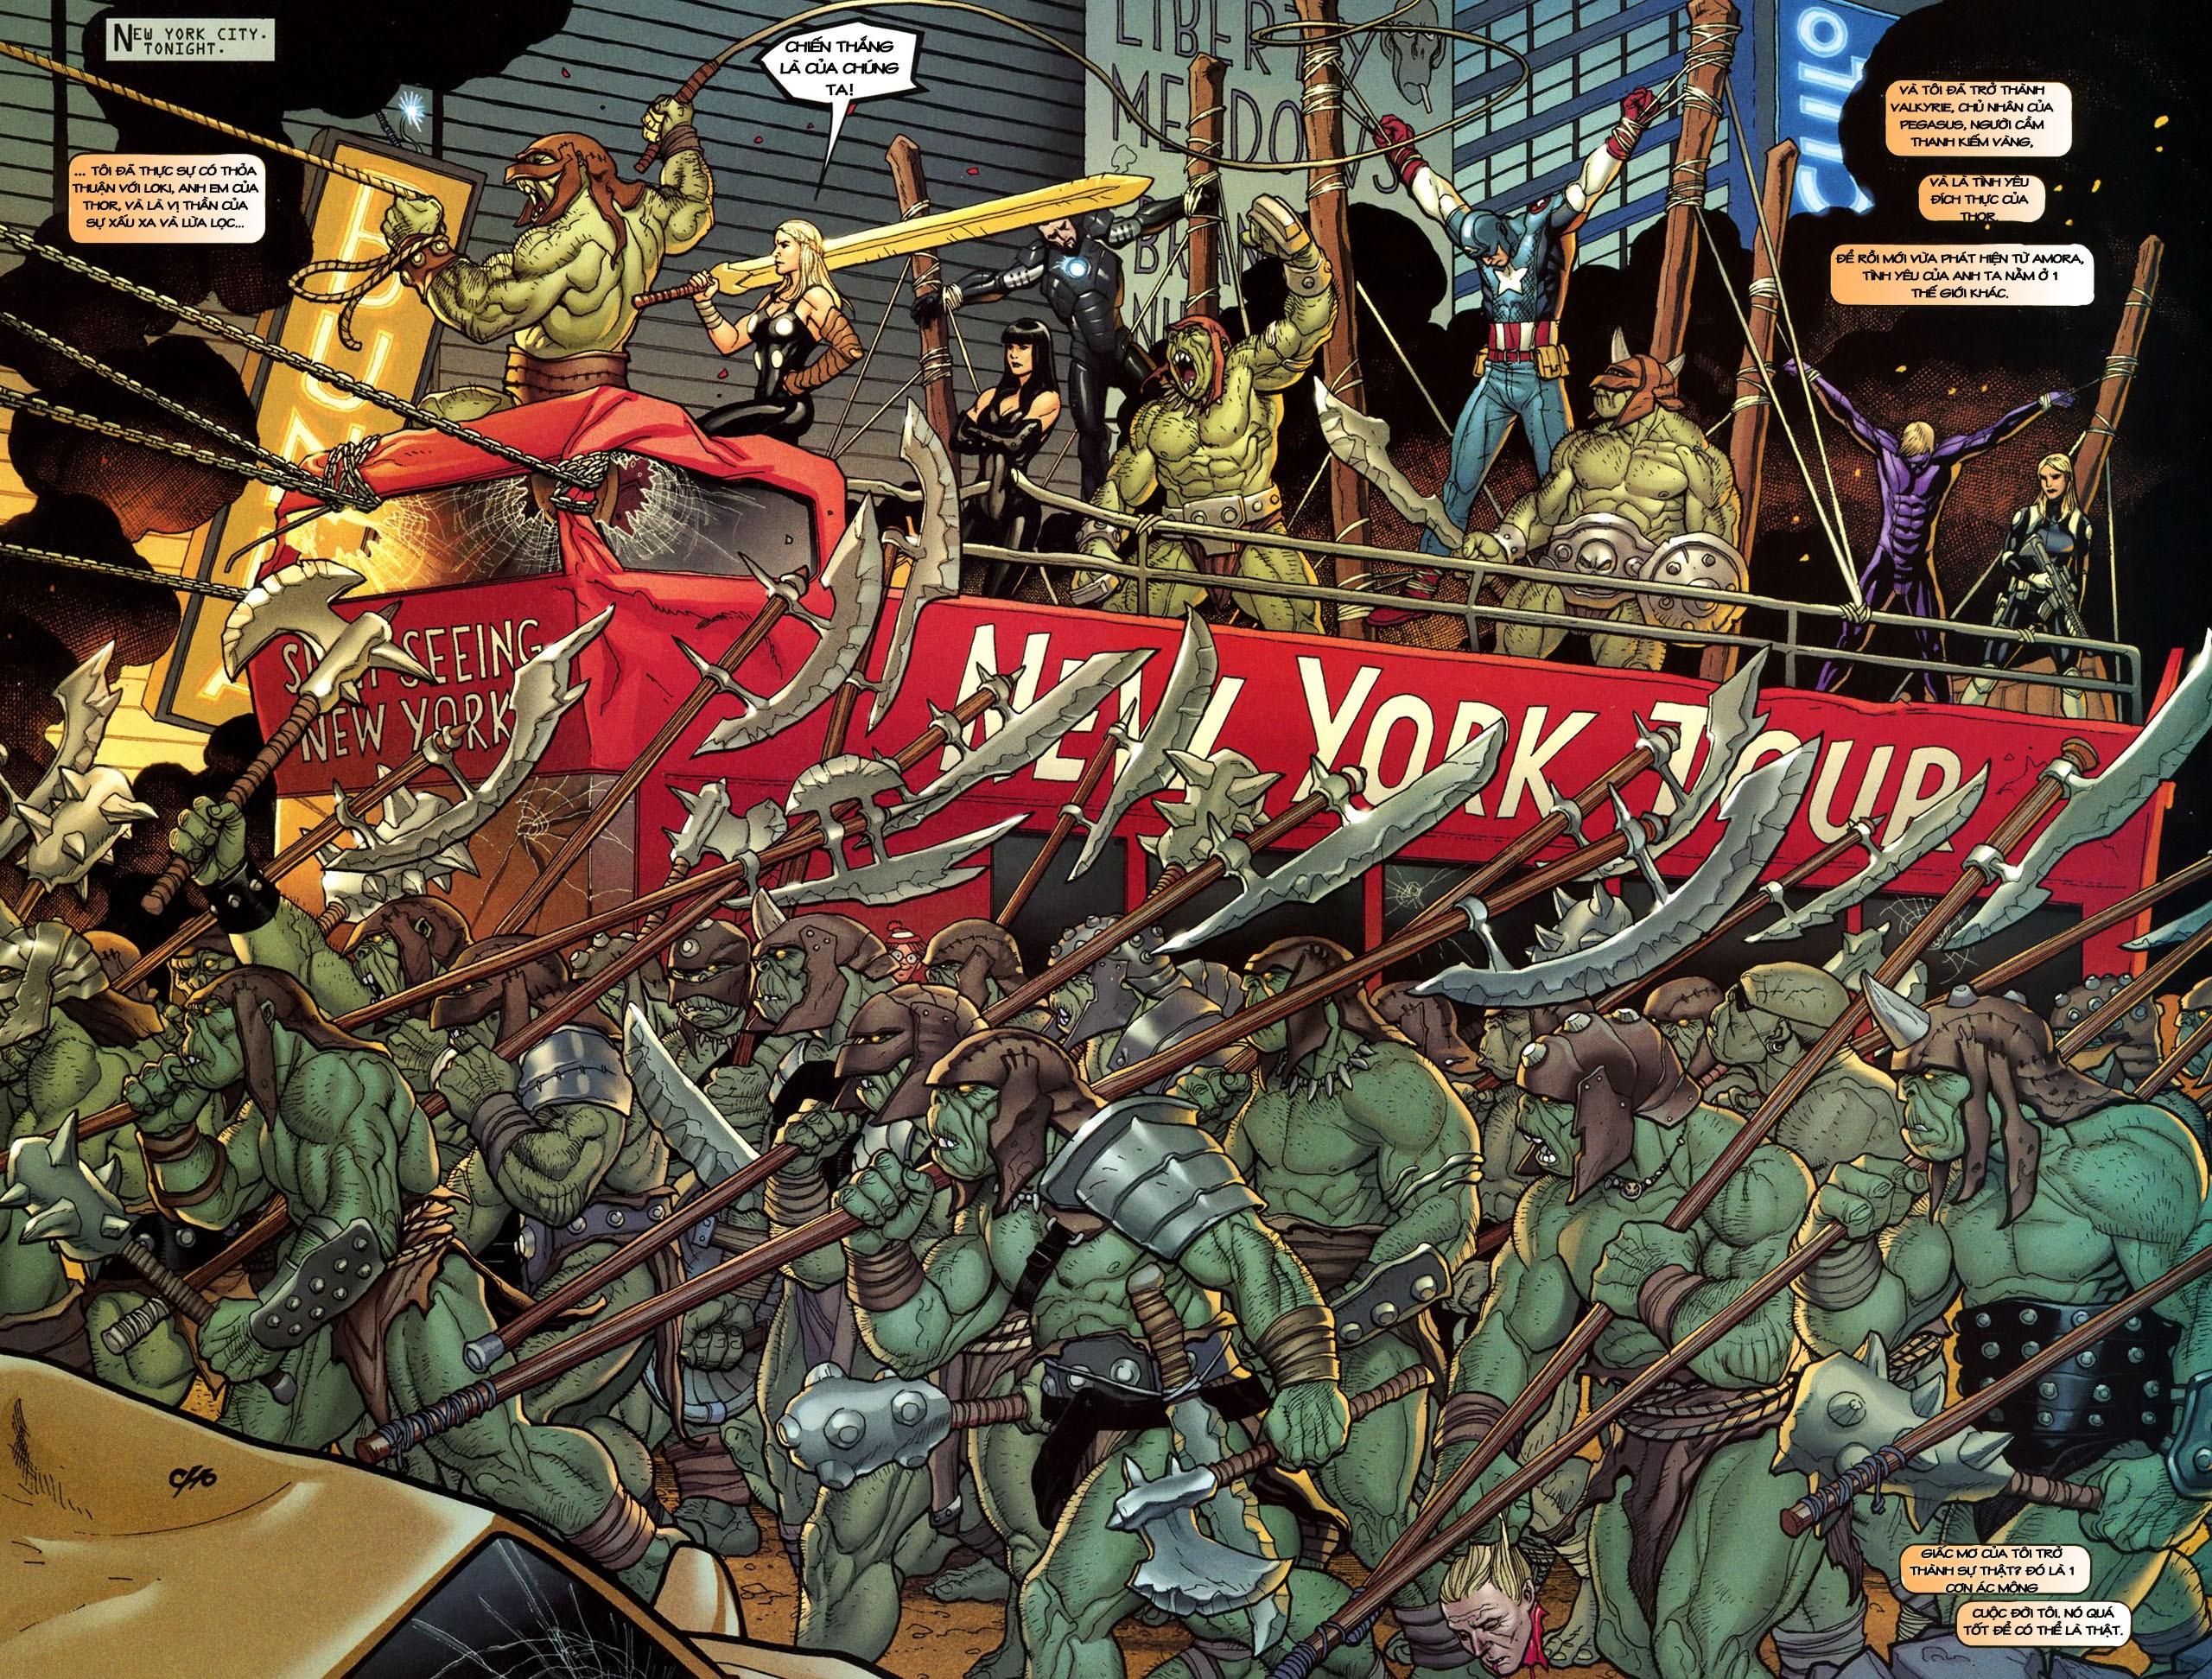 Marvel Civil War Desktop Wallpaper Images Crazy Gallery 2560x1943